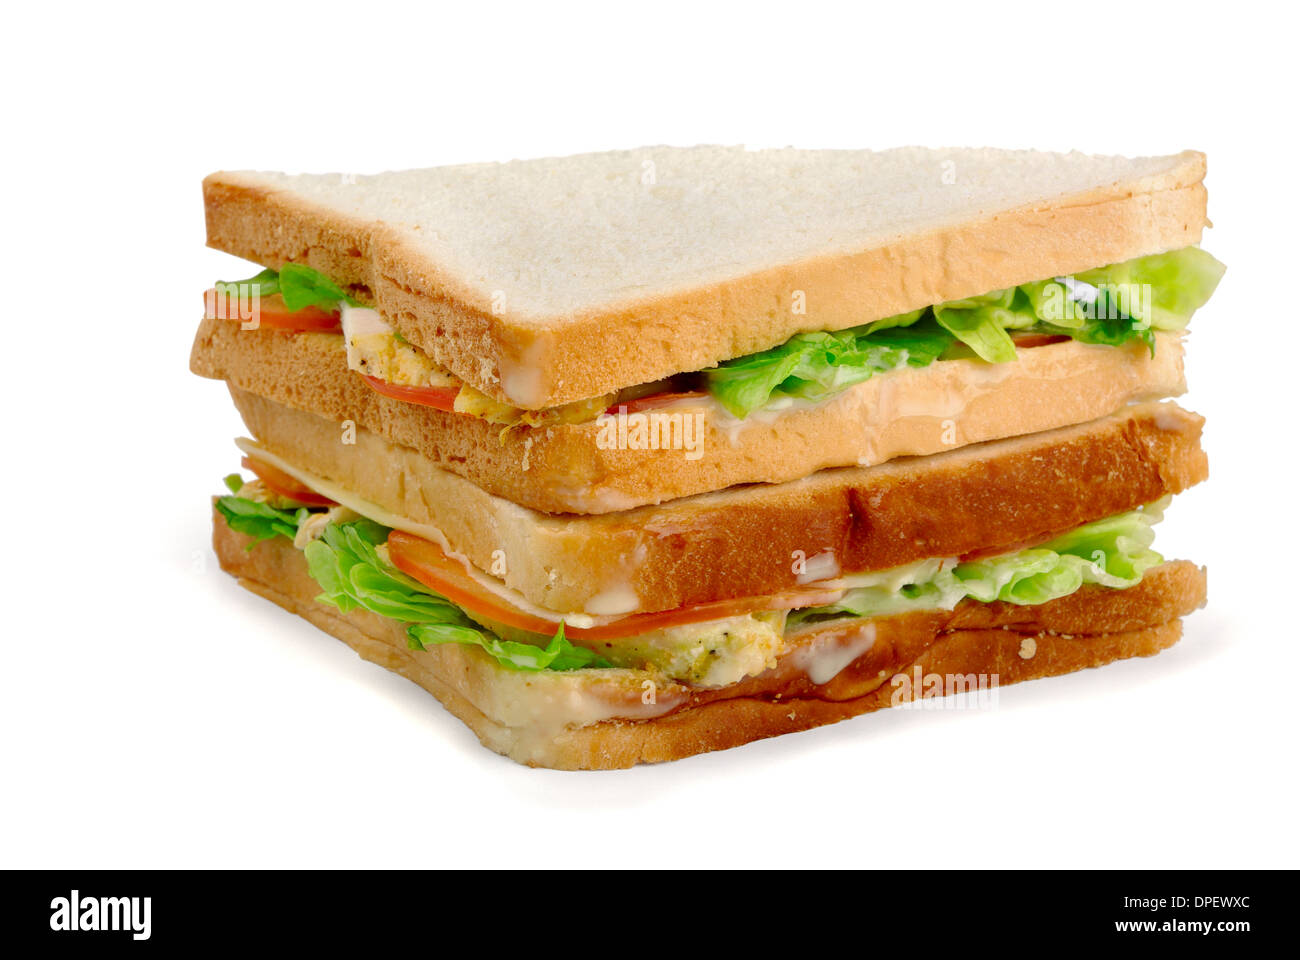 Chicken sandwich on a white background - Stock Image